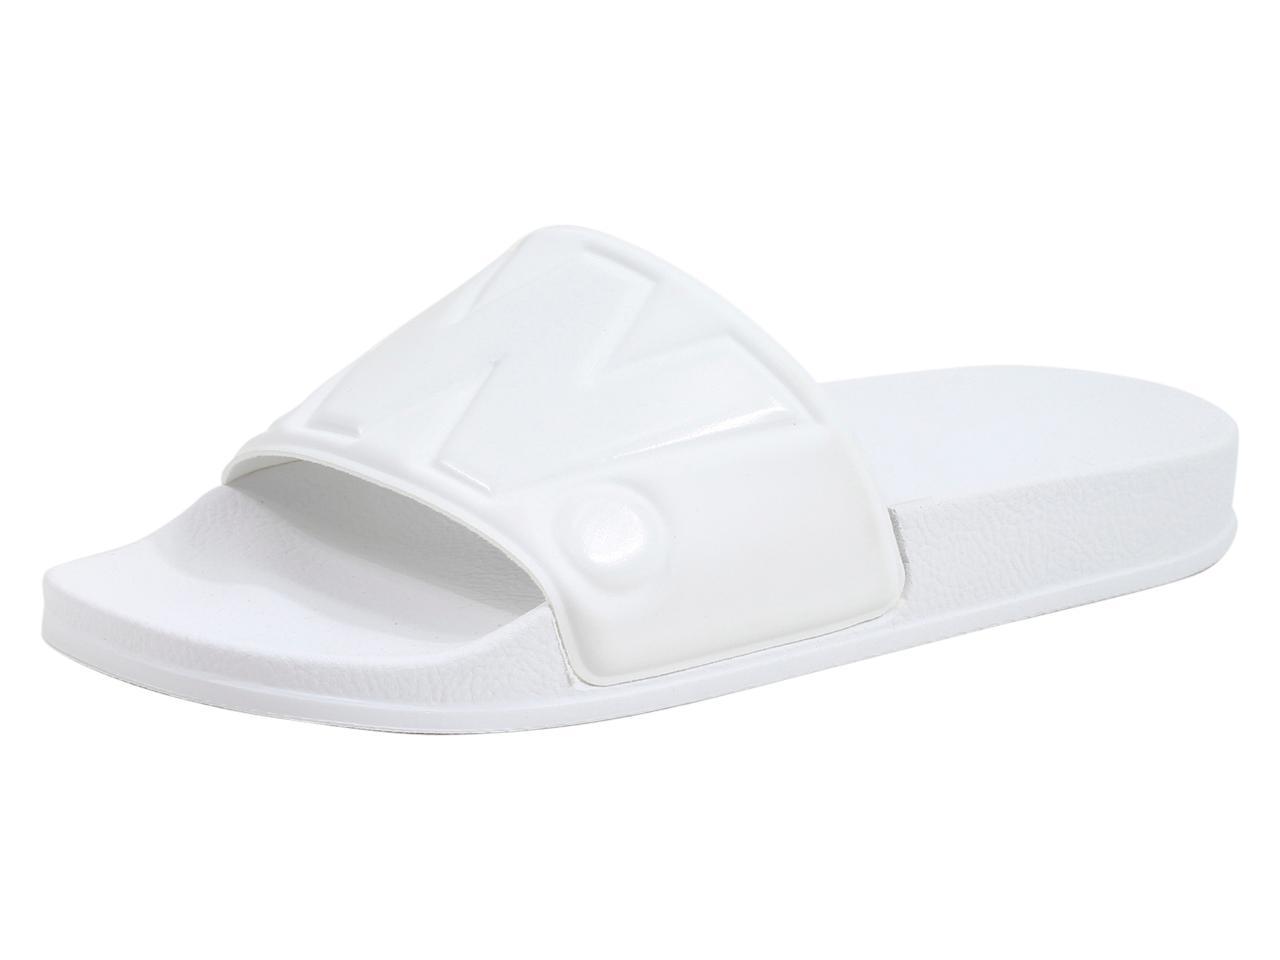 Image of G Star Raw Men's Cart Slide II Slides Sandals Shoes - White - 11 D(M) US